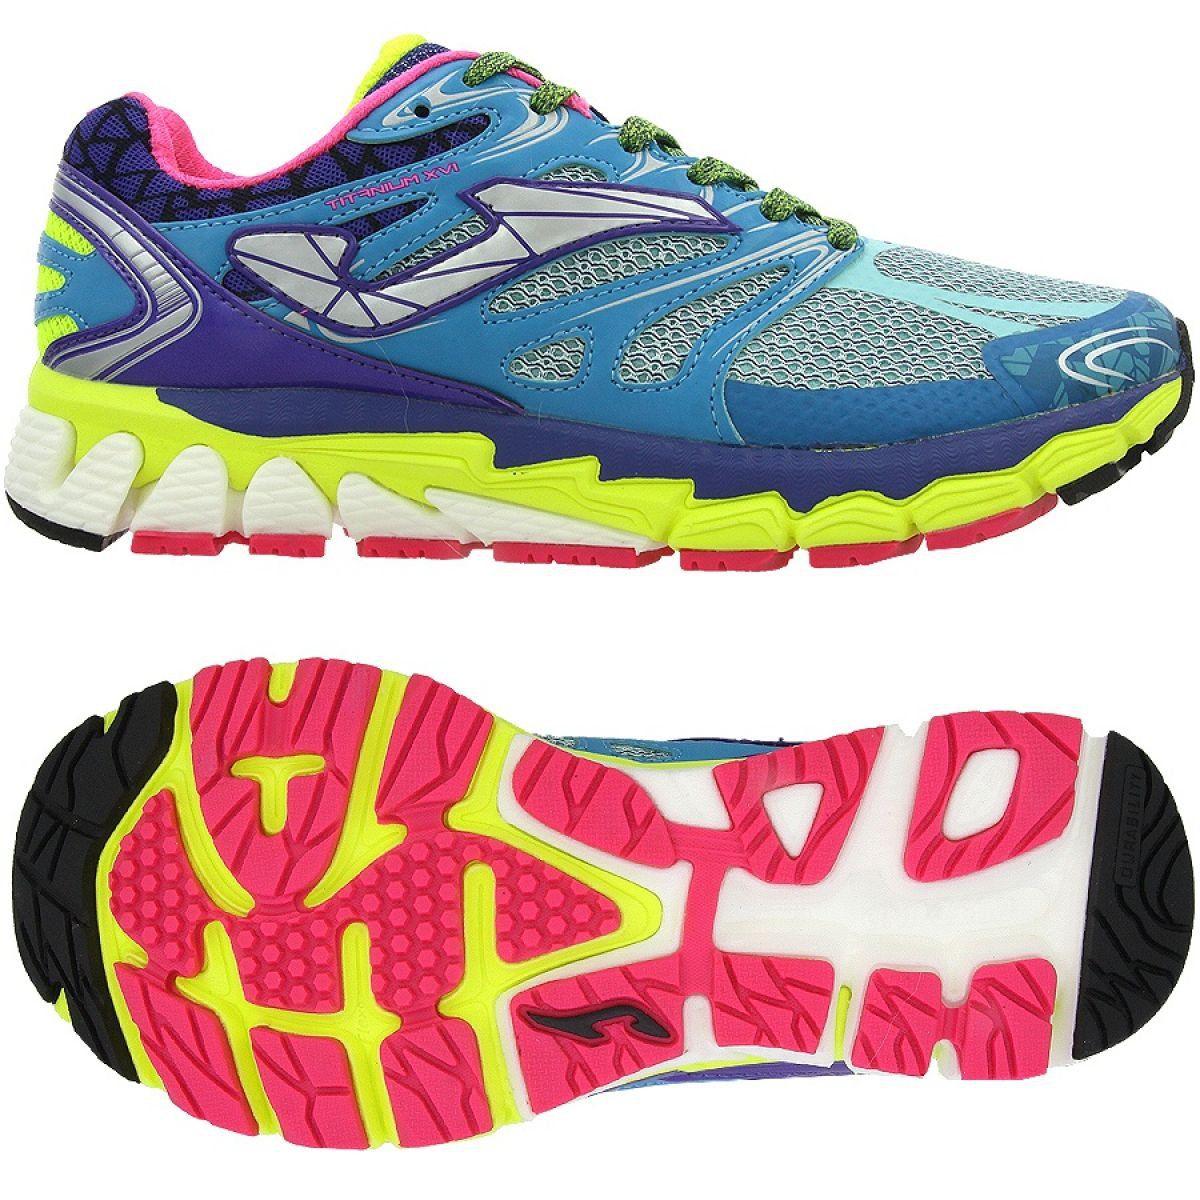 Buty Biegowe Joma R Titanium Lady W R Titals 705 Wielokolorowe Running Shoes Running Joma